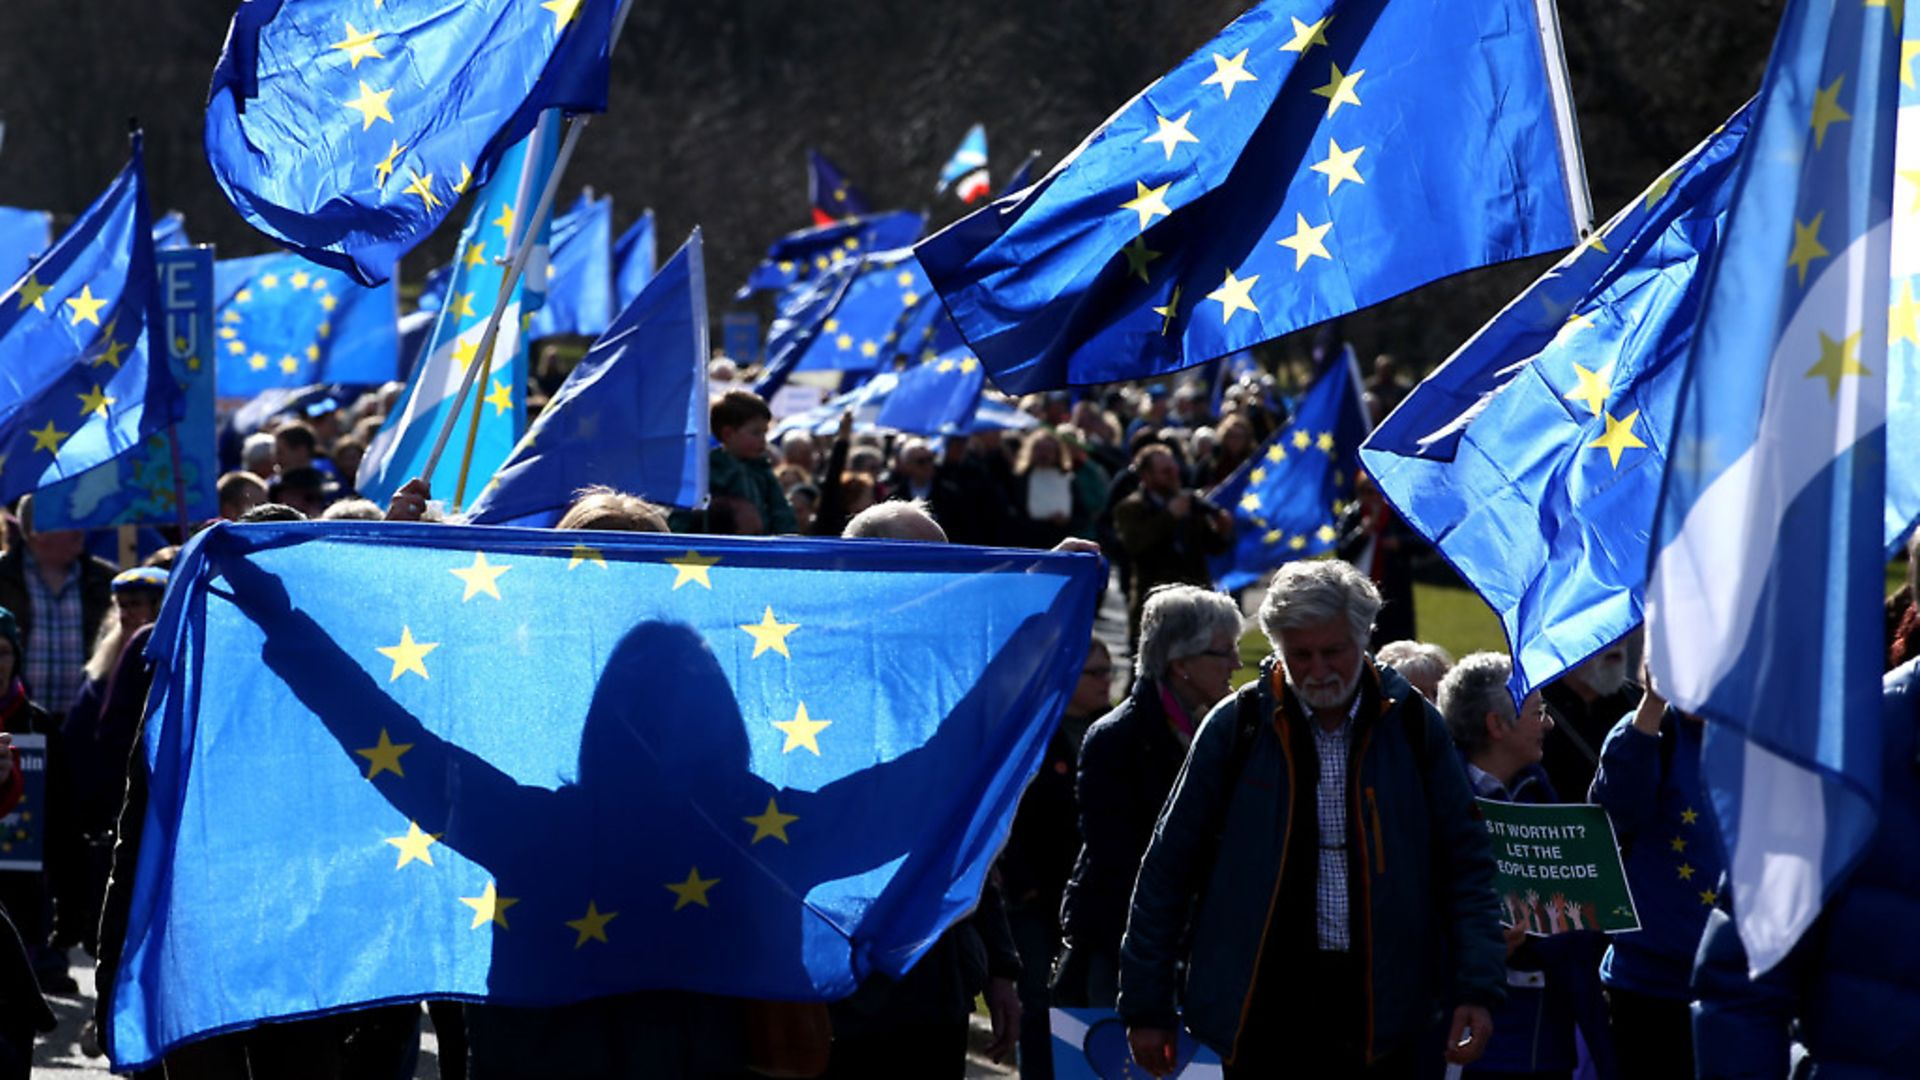 Anti-Brexit campaigners protesting in Edinburgh. Photograph: Jane Barlow/PA Wire - Credit: PA